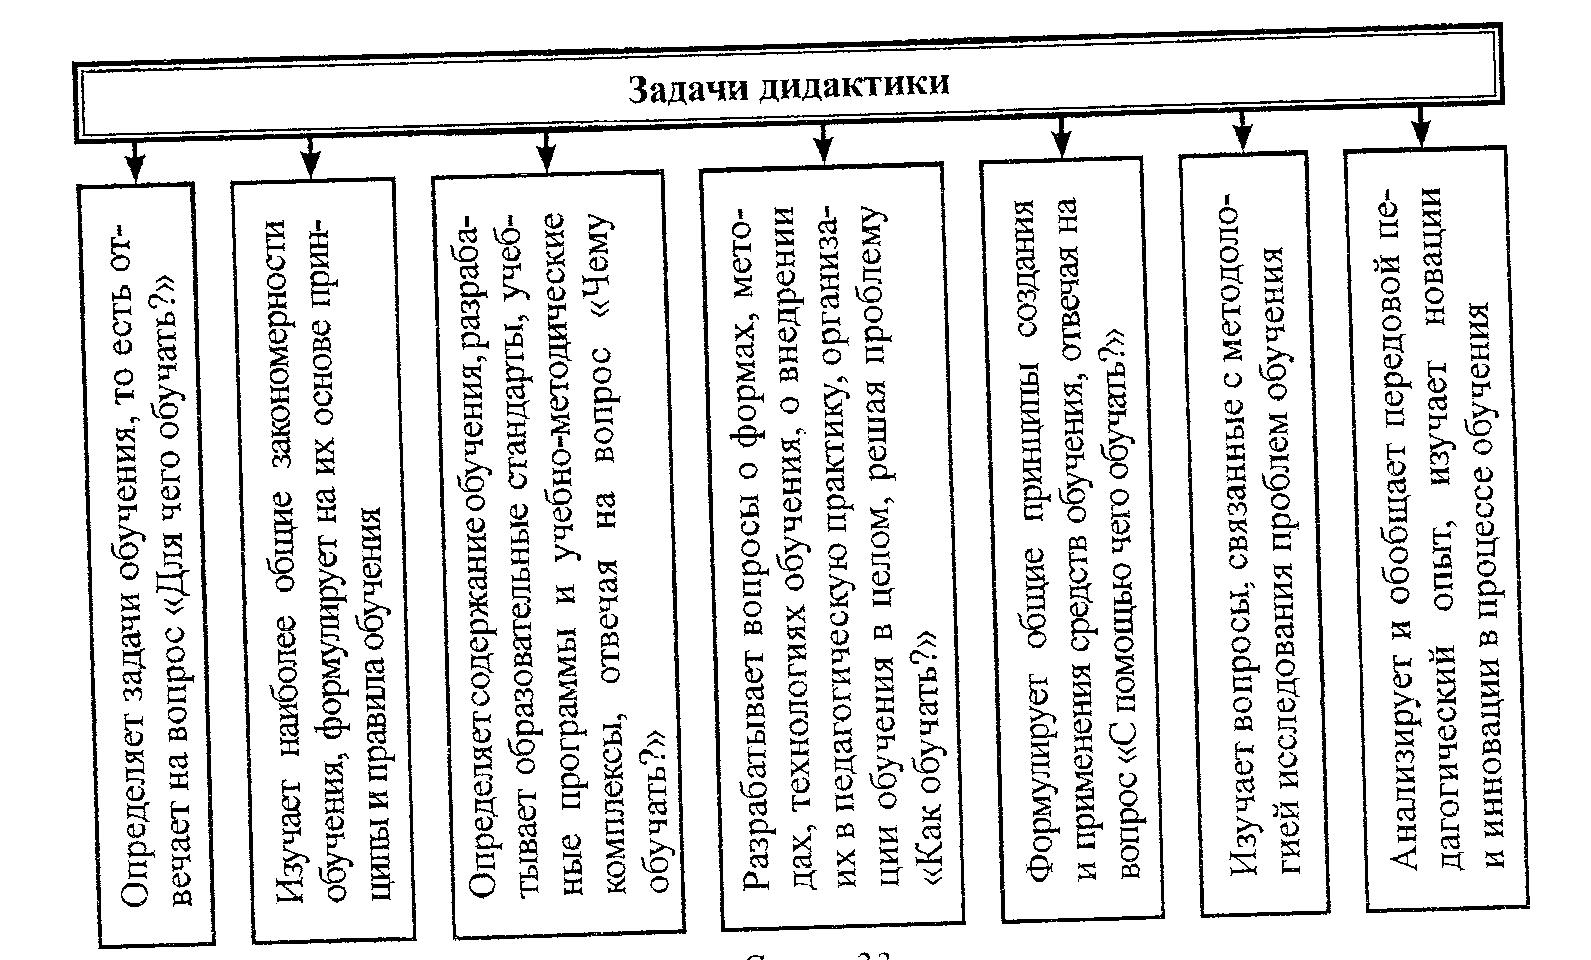 уровни методологии педагогики схема